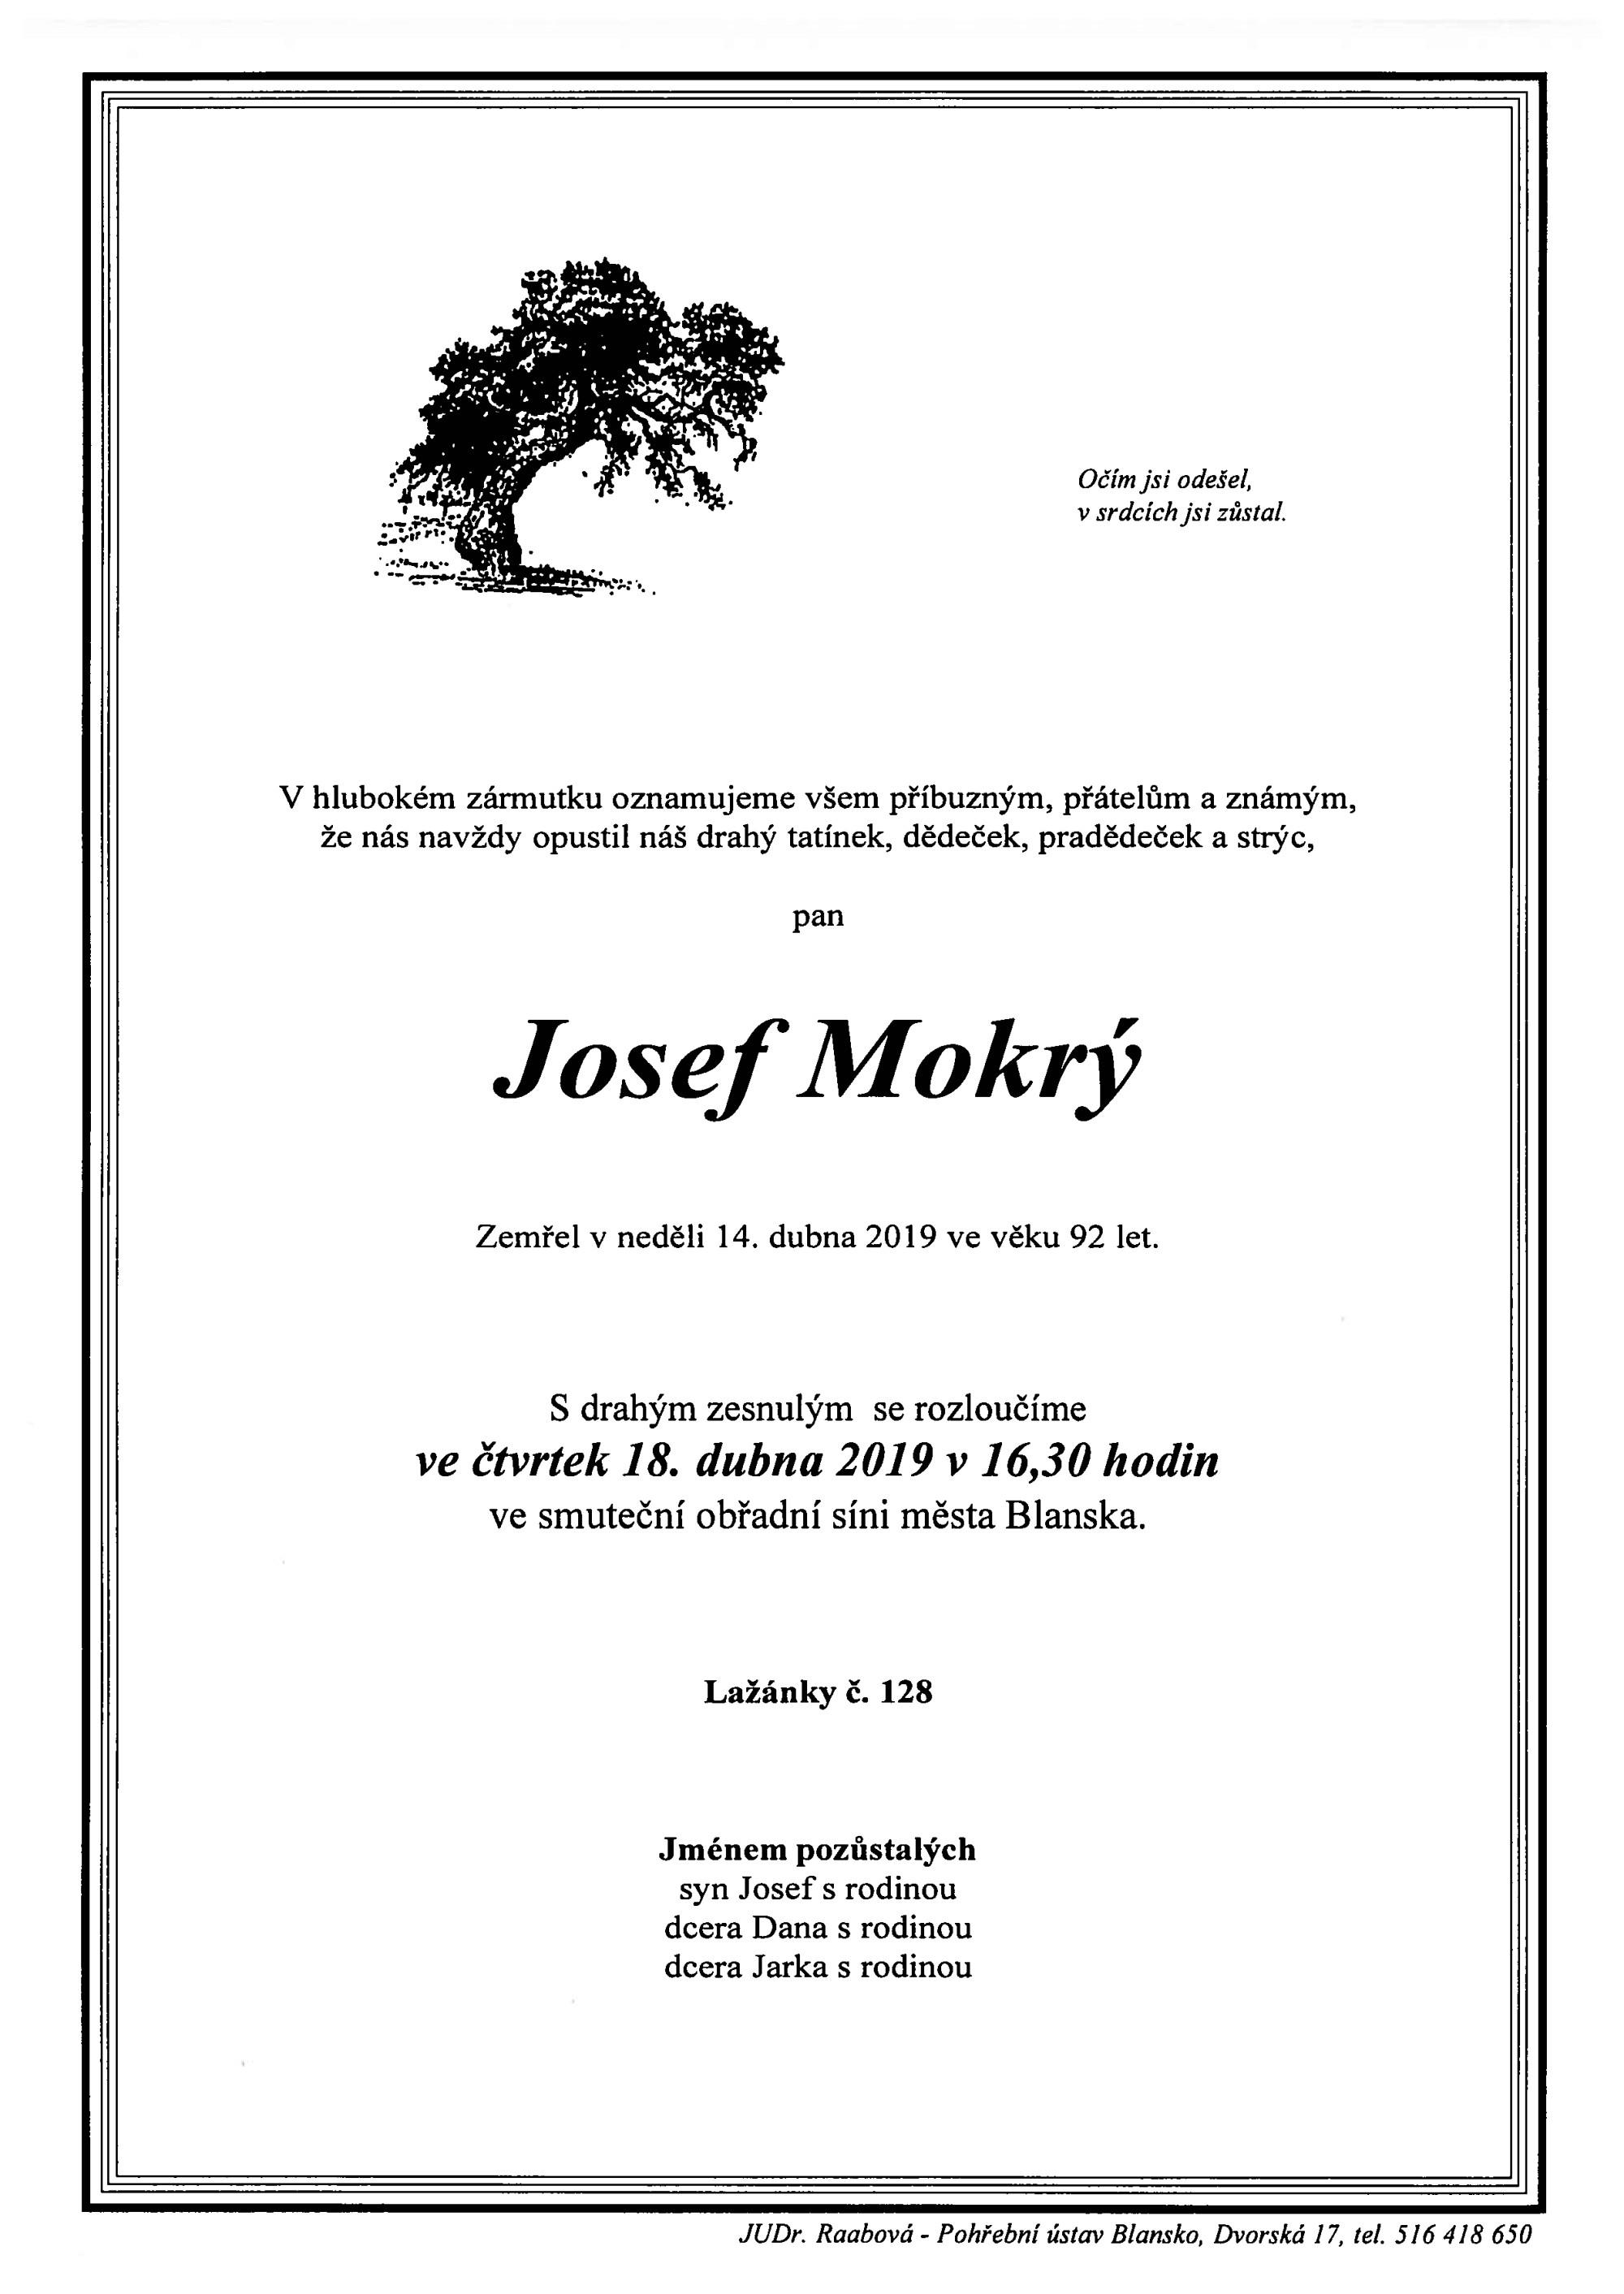 Josef Mokrý